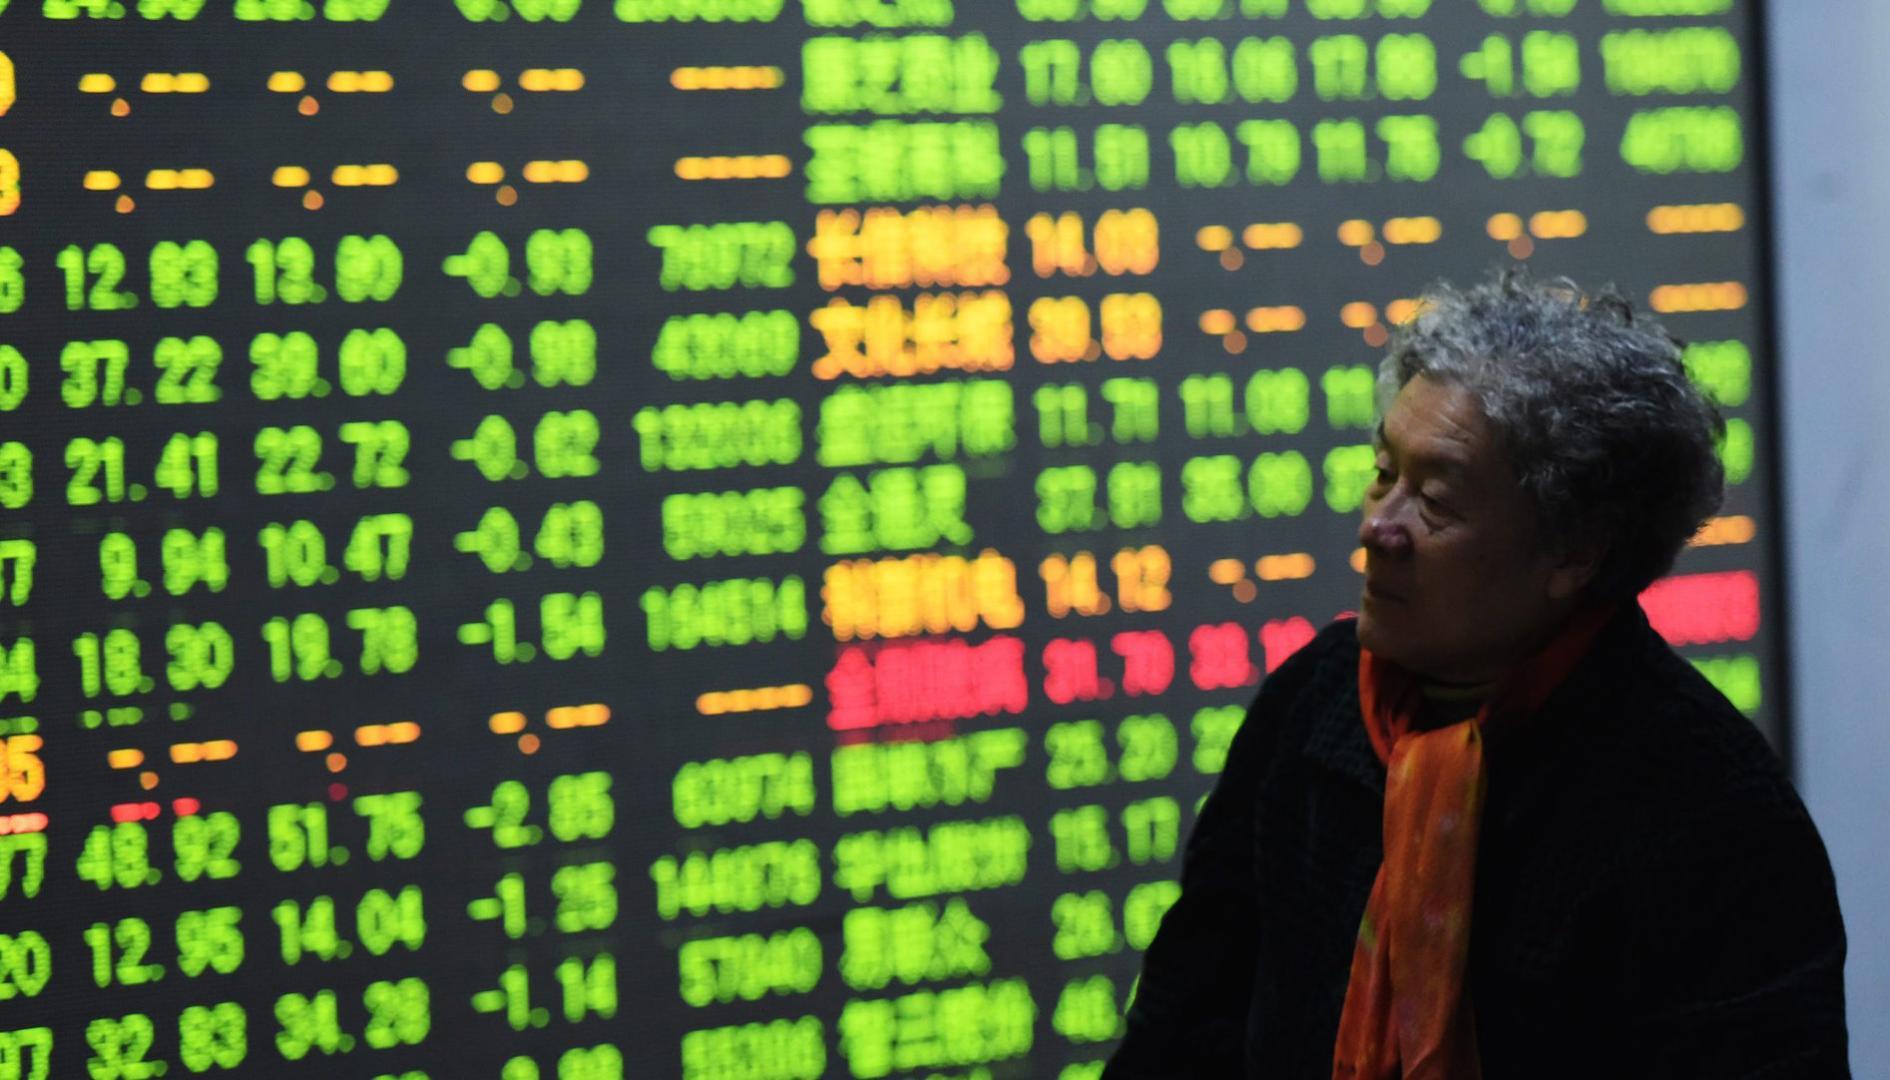 5 myths about China's economy